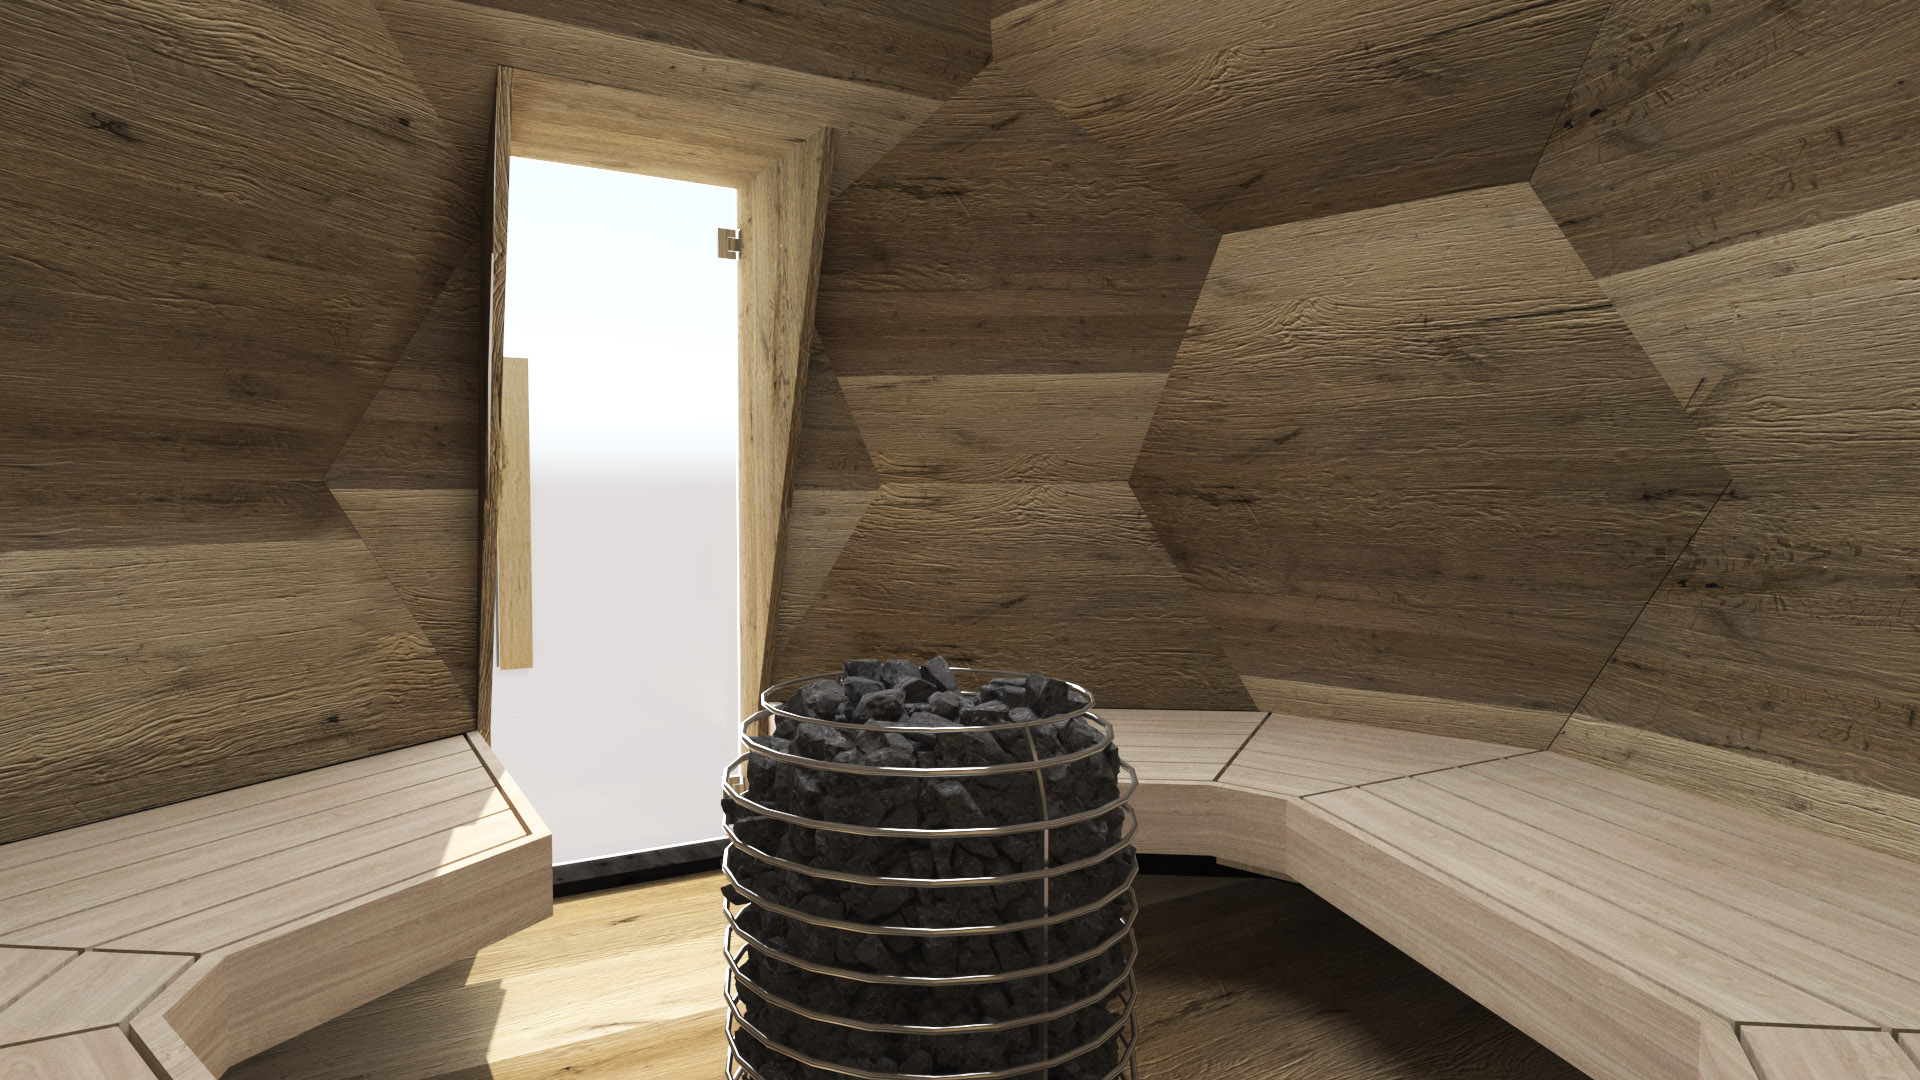 INUA Odin Geodatisk udendoers finsk sauna3